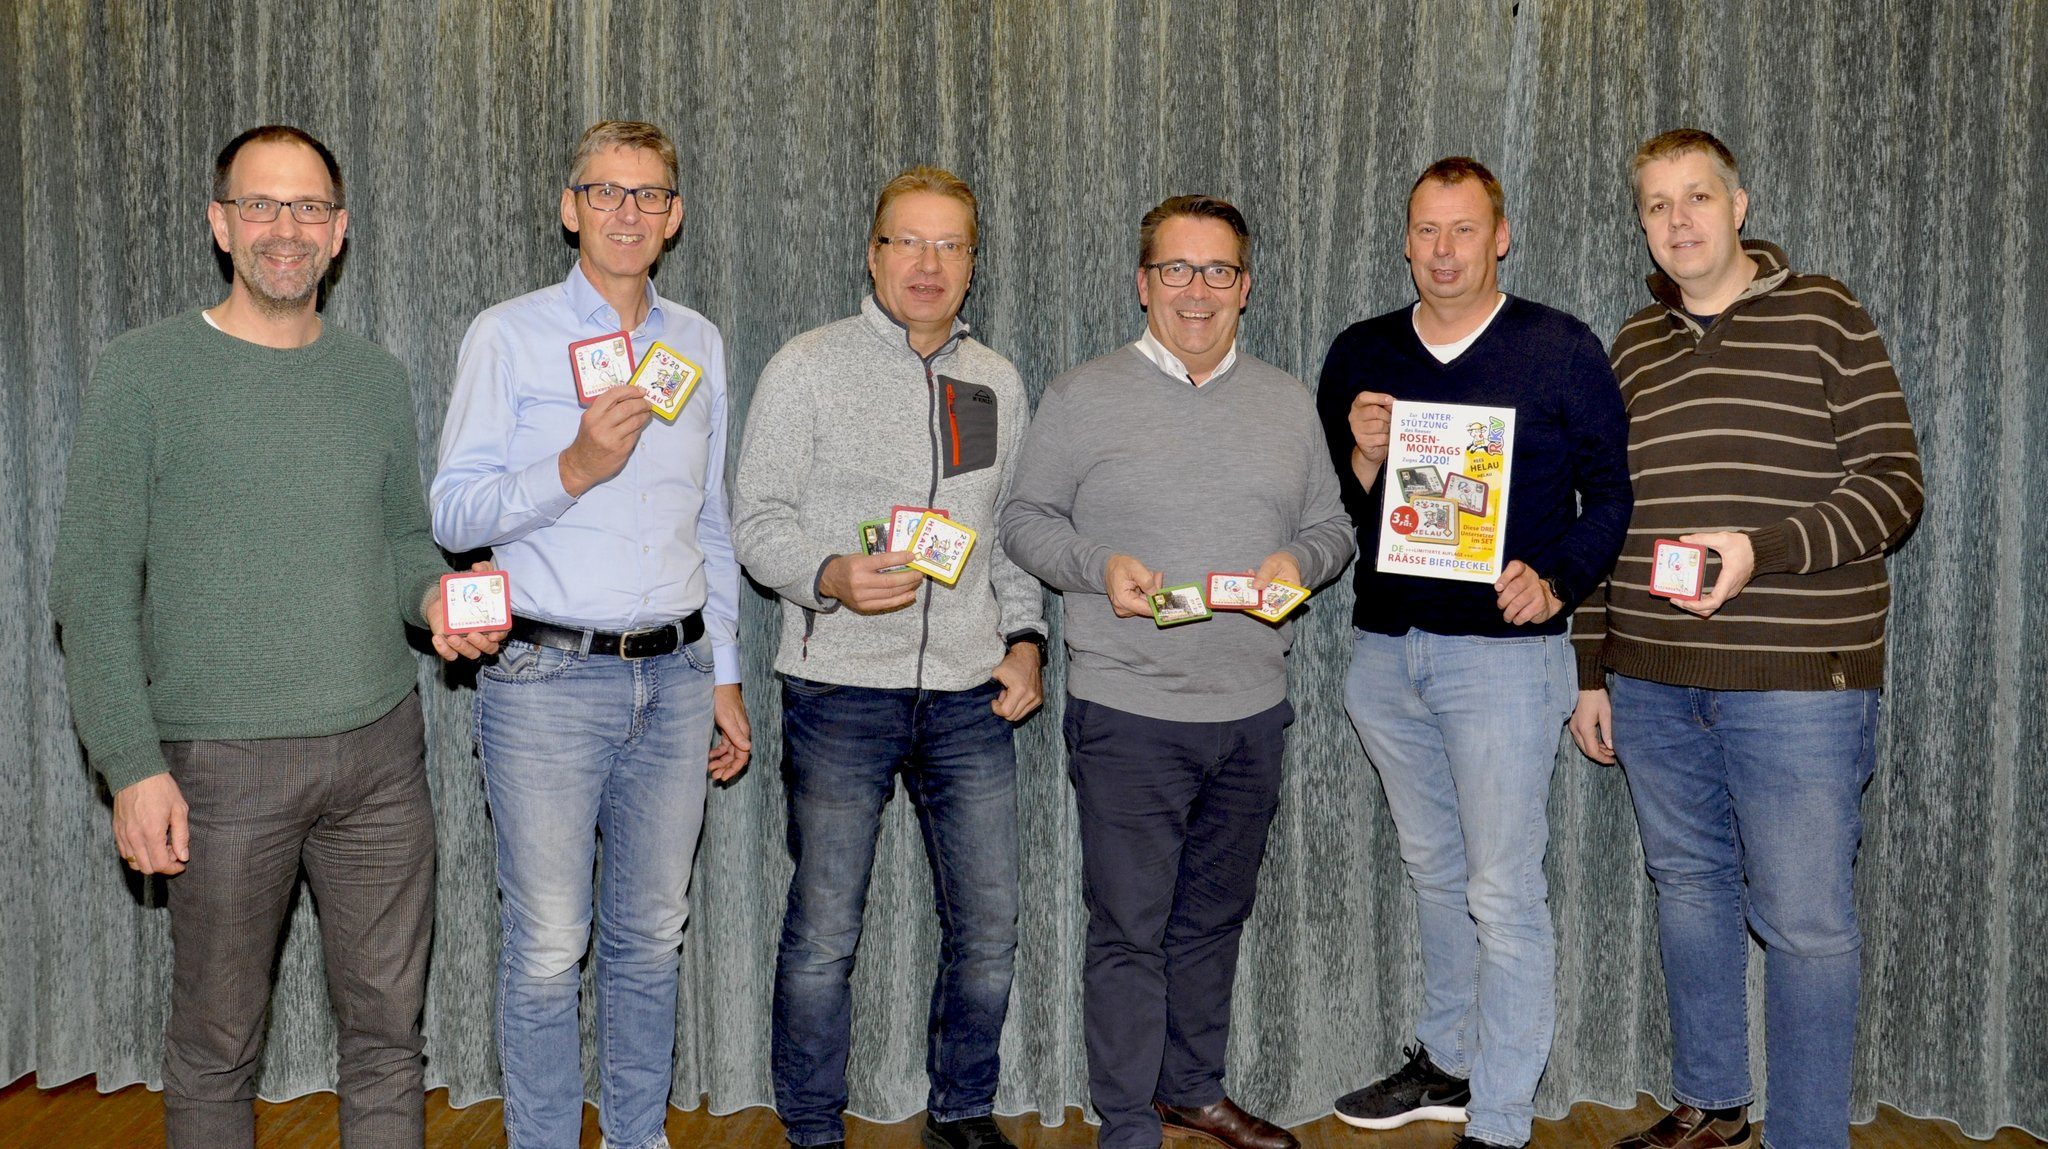 Karneval in Rees: Hämme wej ok genn Kneipe mehr, Fastelovend fiere wej bes märge - Rees - Lokalkompass.de